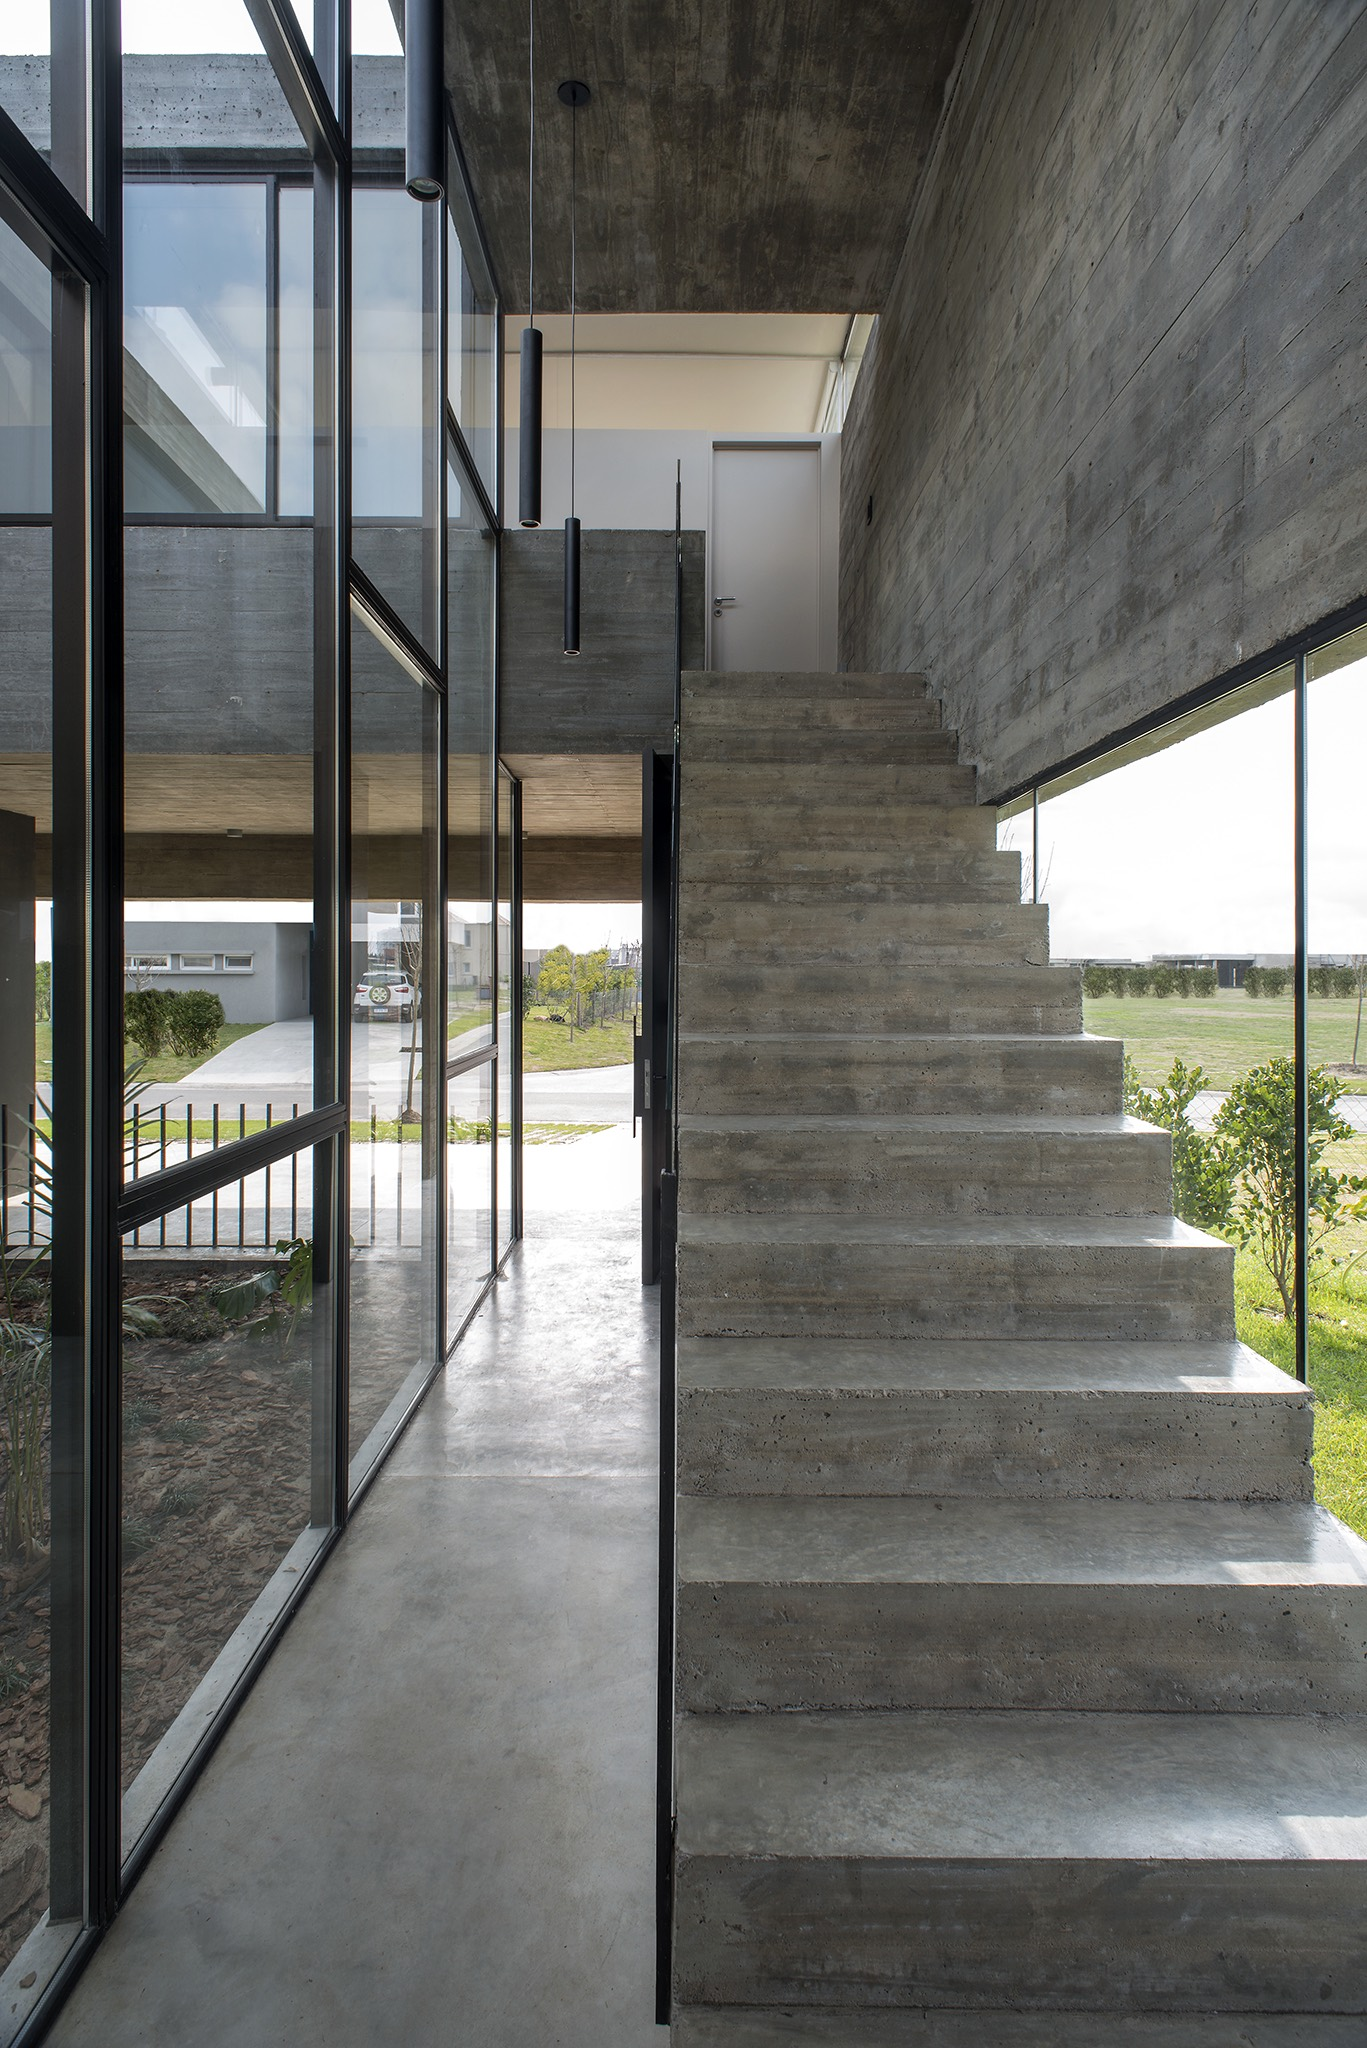 concrete staircase near the glass window